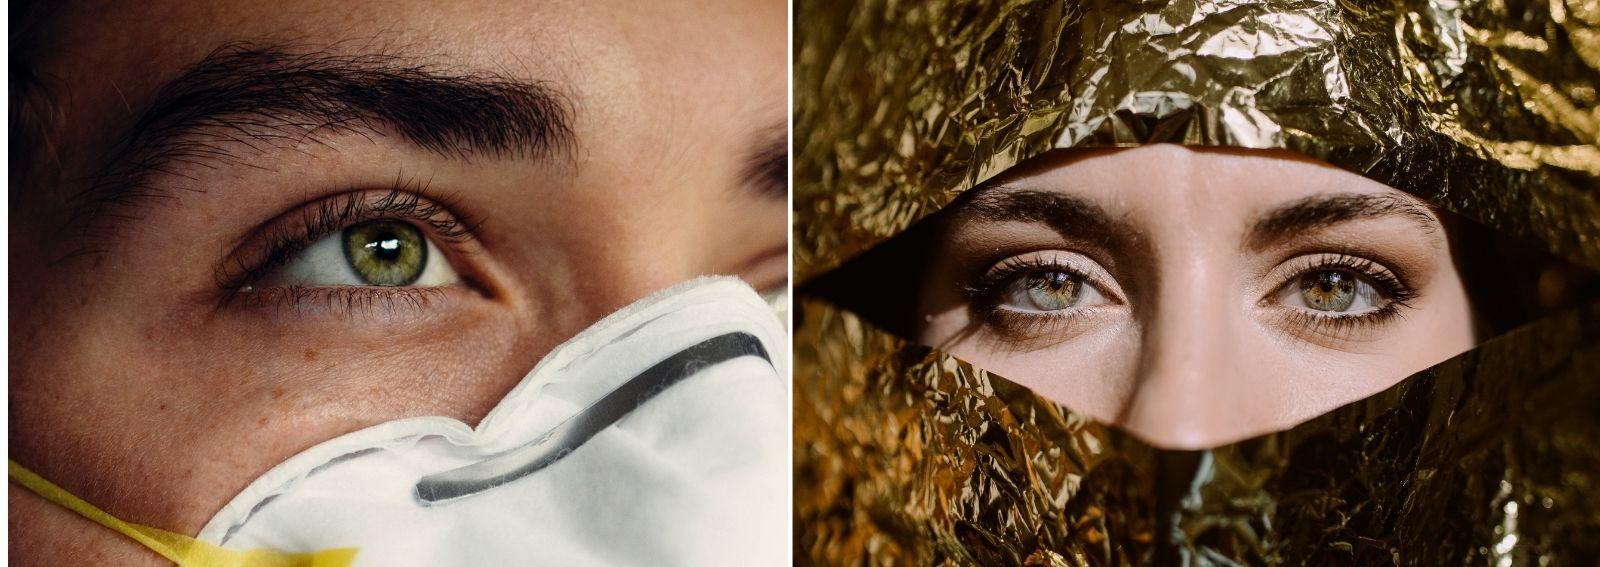 mascara cover